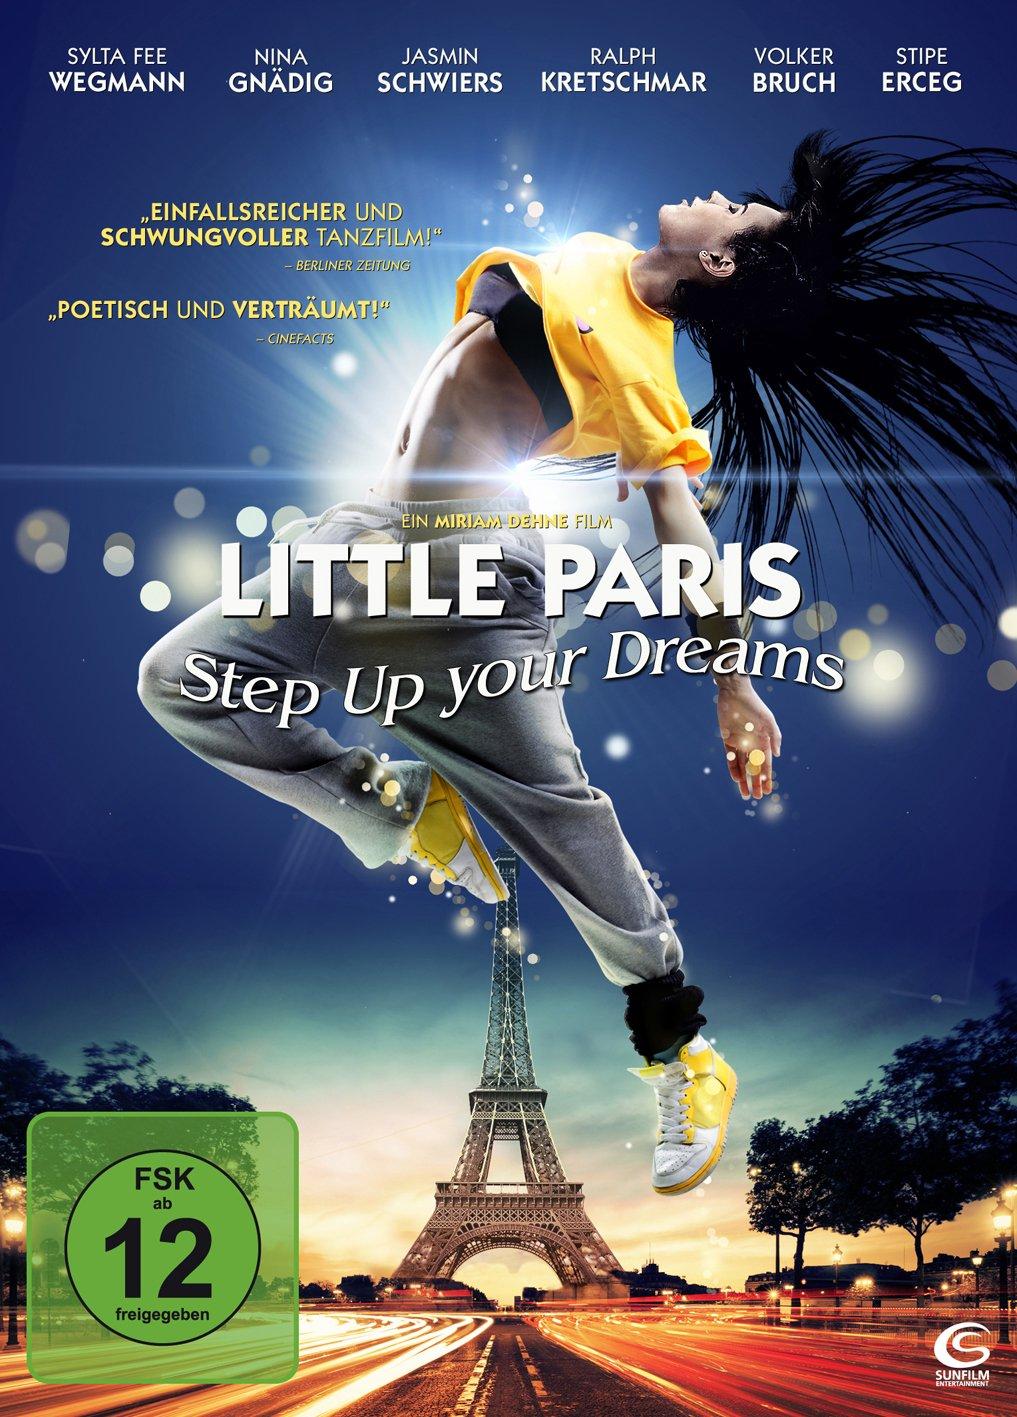 Little Paris - Step up your Dreams: Amazon.de: Sylta Fee Wegmann ...